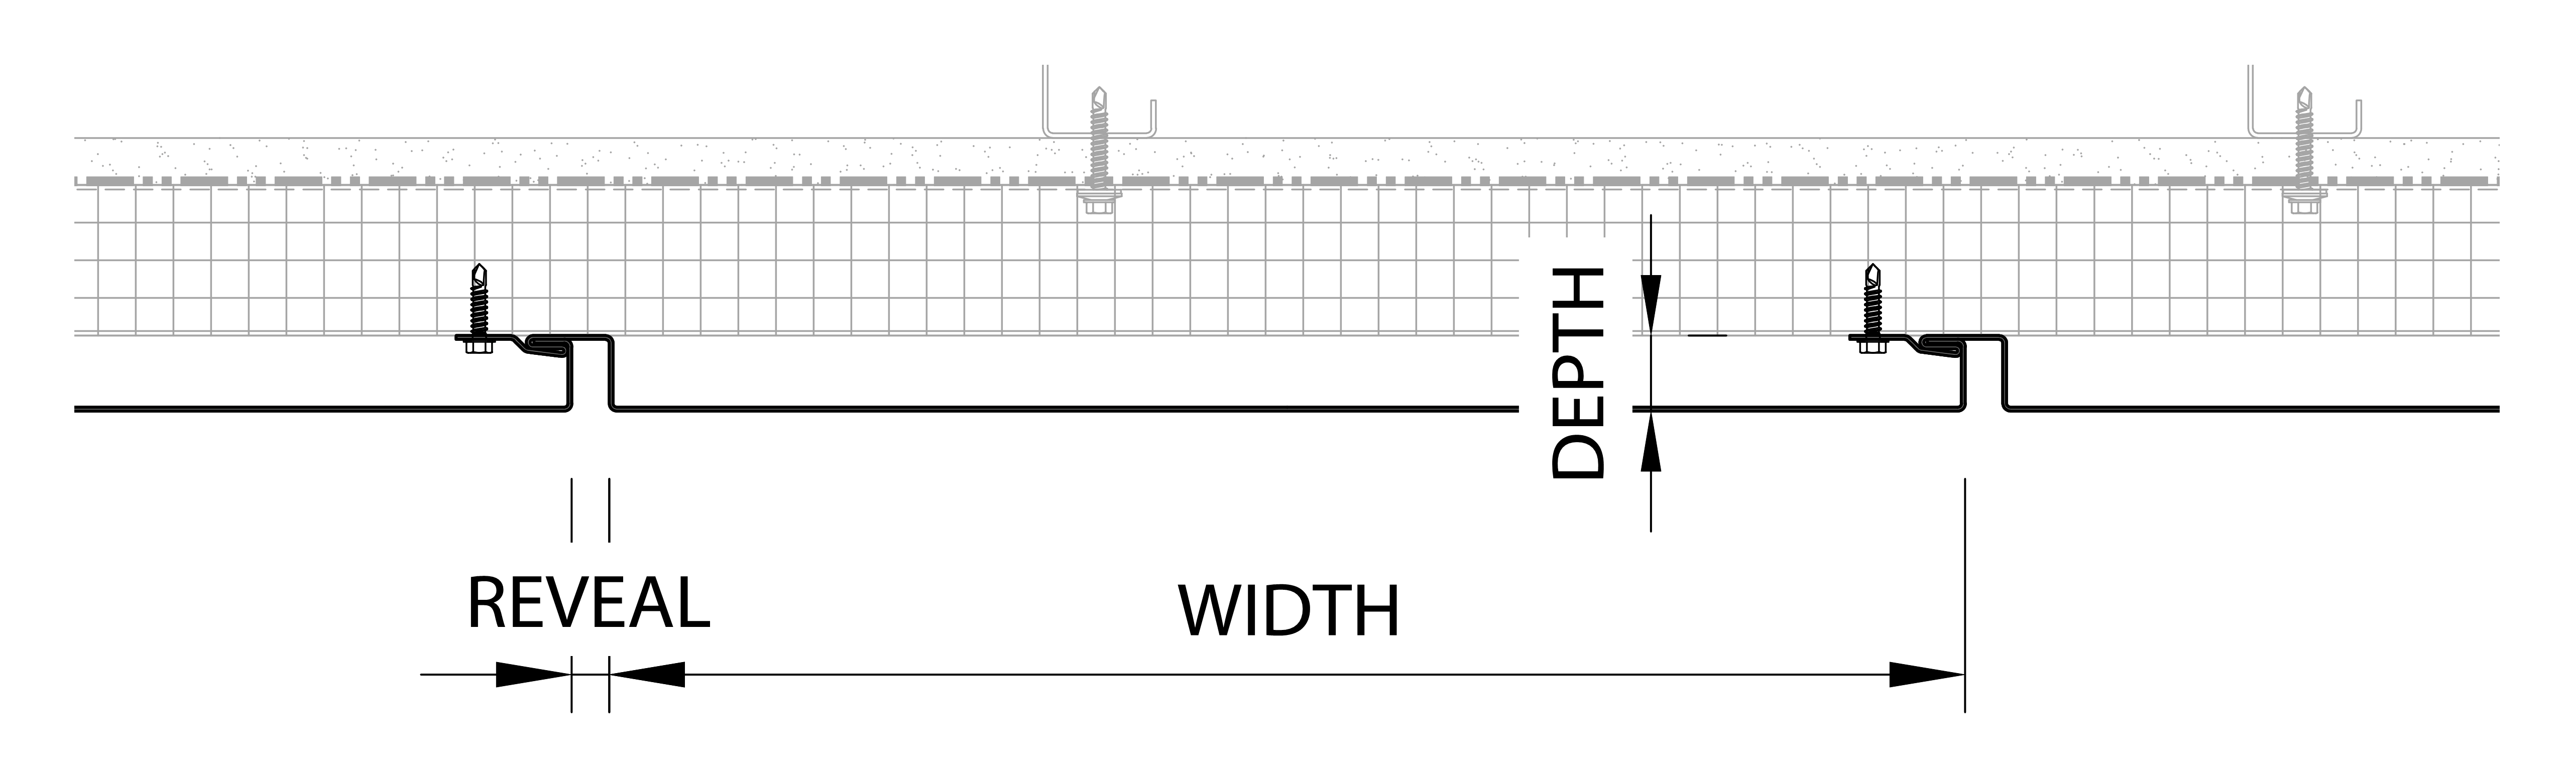 F-Series - Horizontal Detail